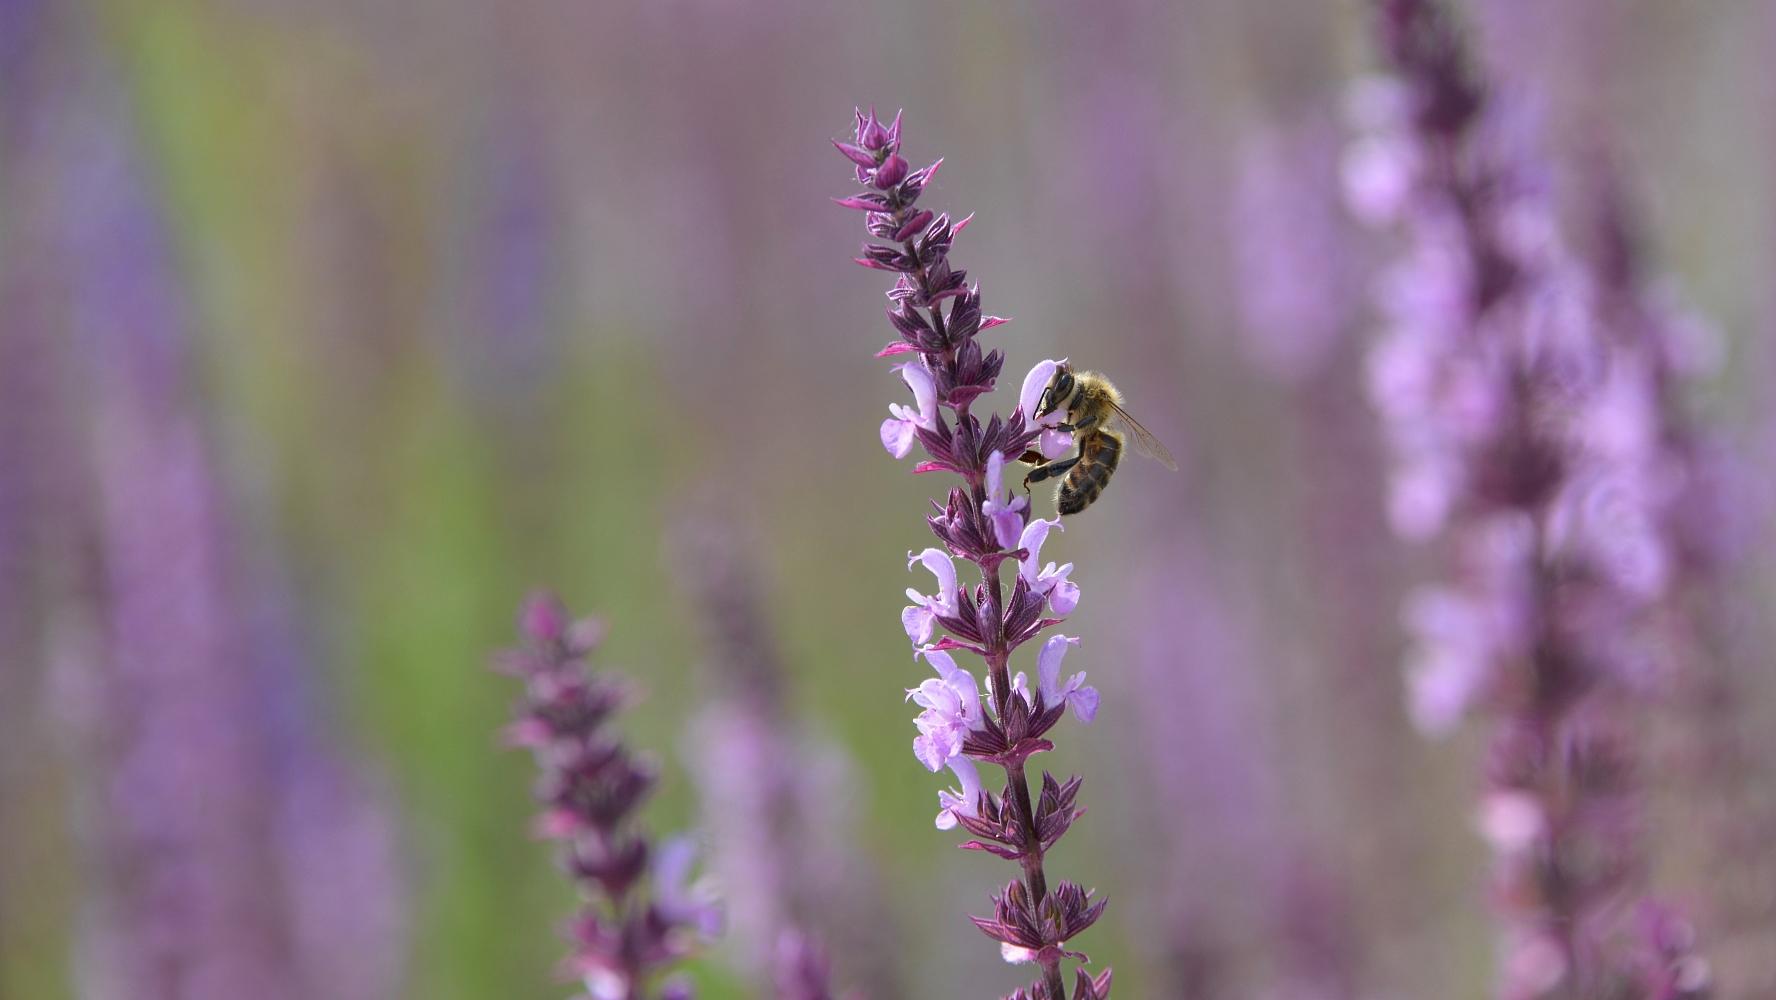 Biene in Magenta © Lars Baus 2017